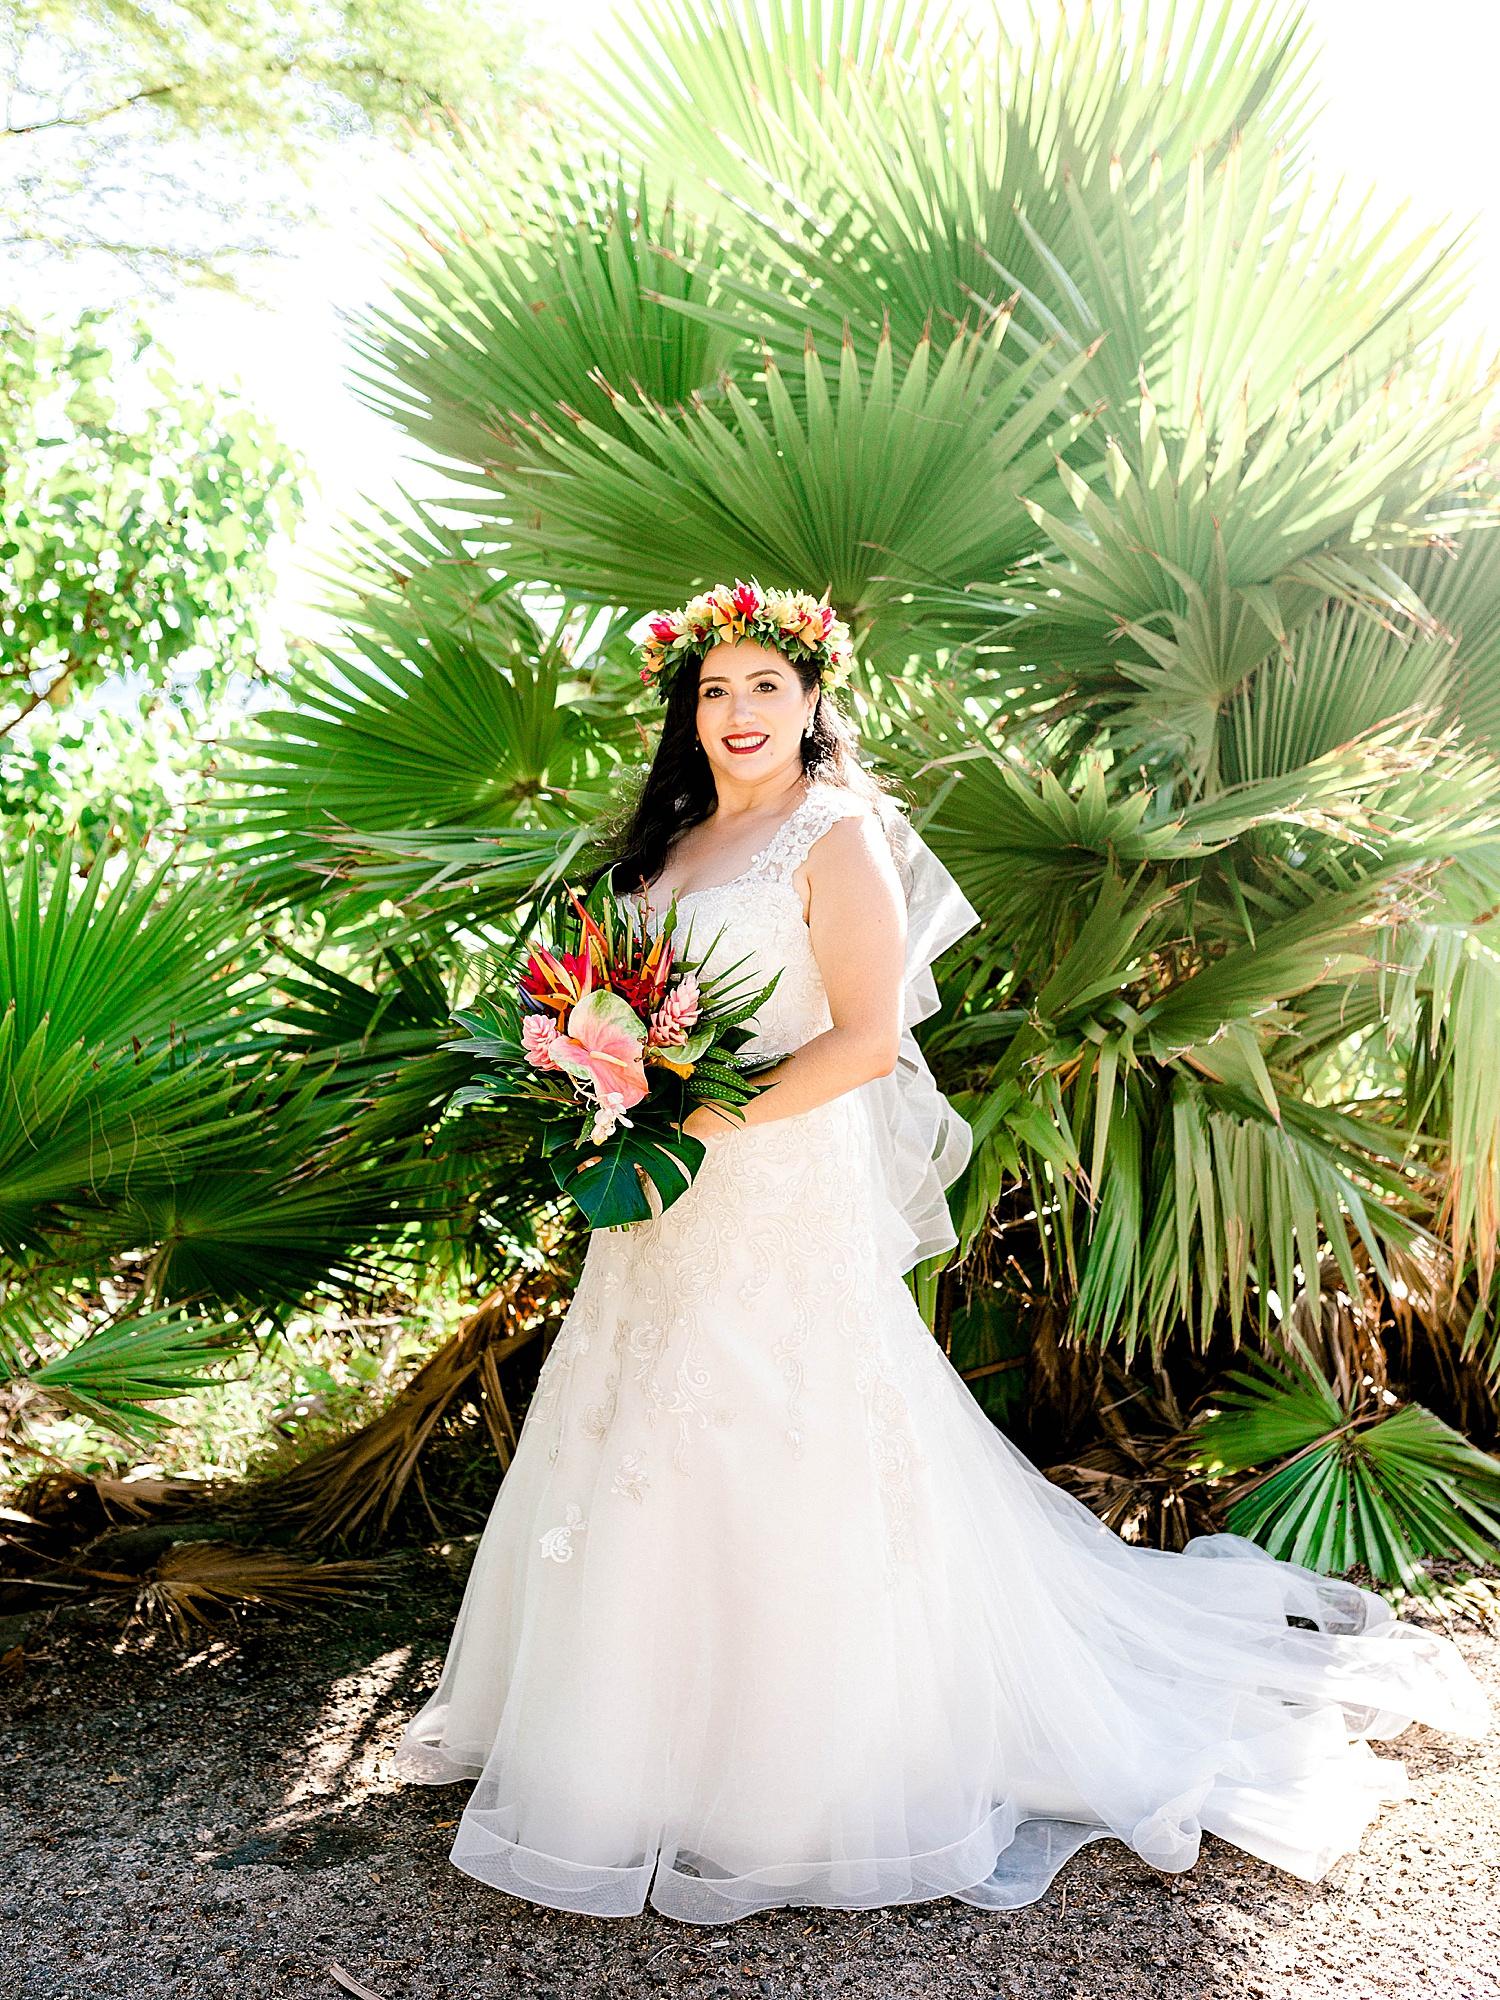 Maui-Wedding-Bride-and-Groom-Portraits-Launiupoko-Beach_0006.jpg